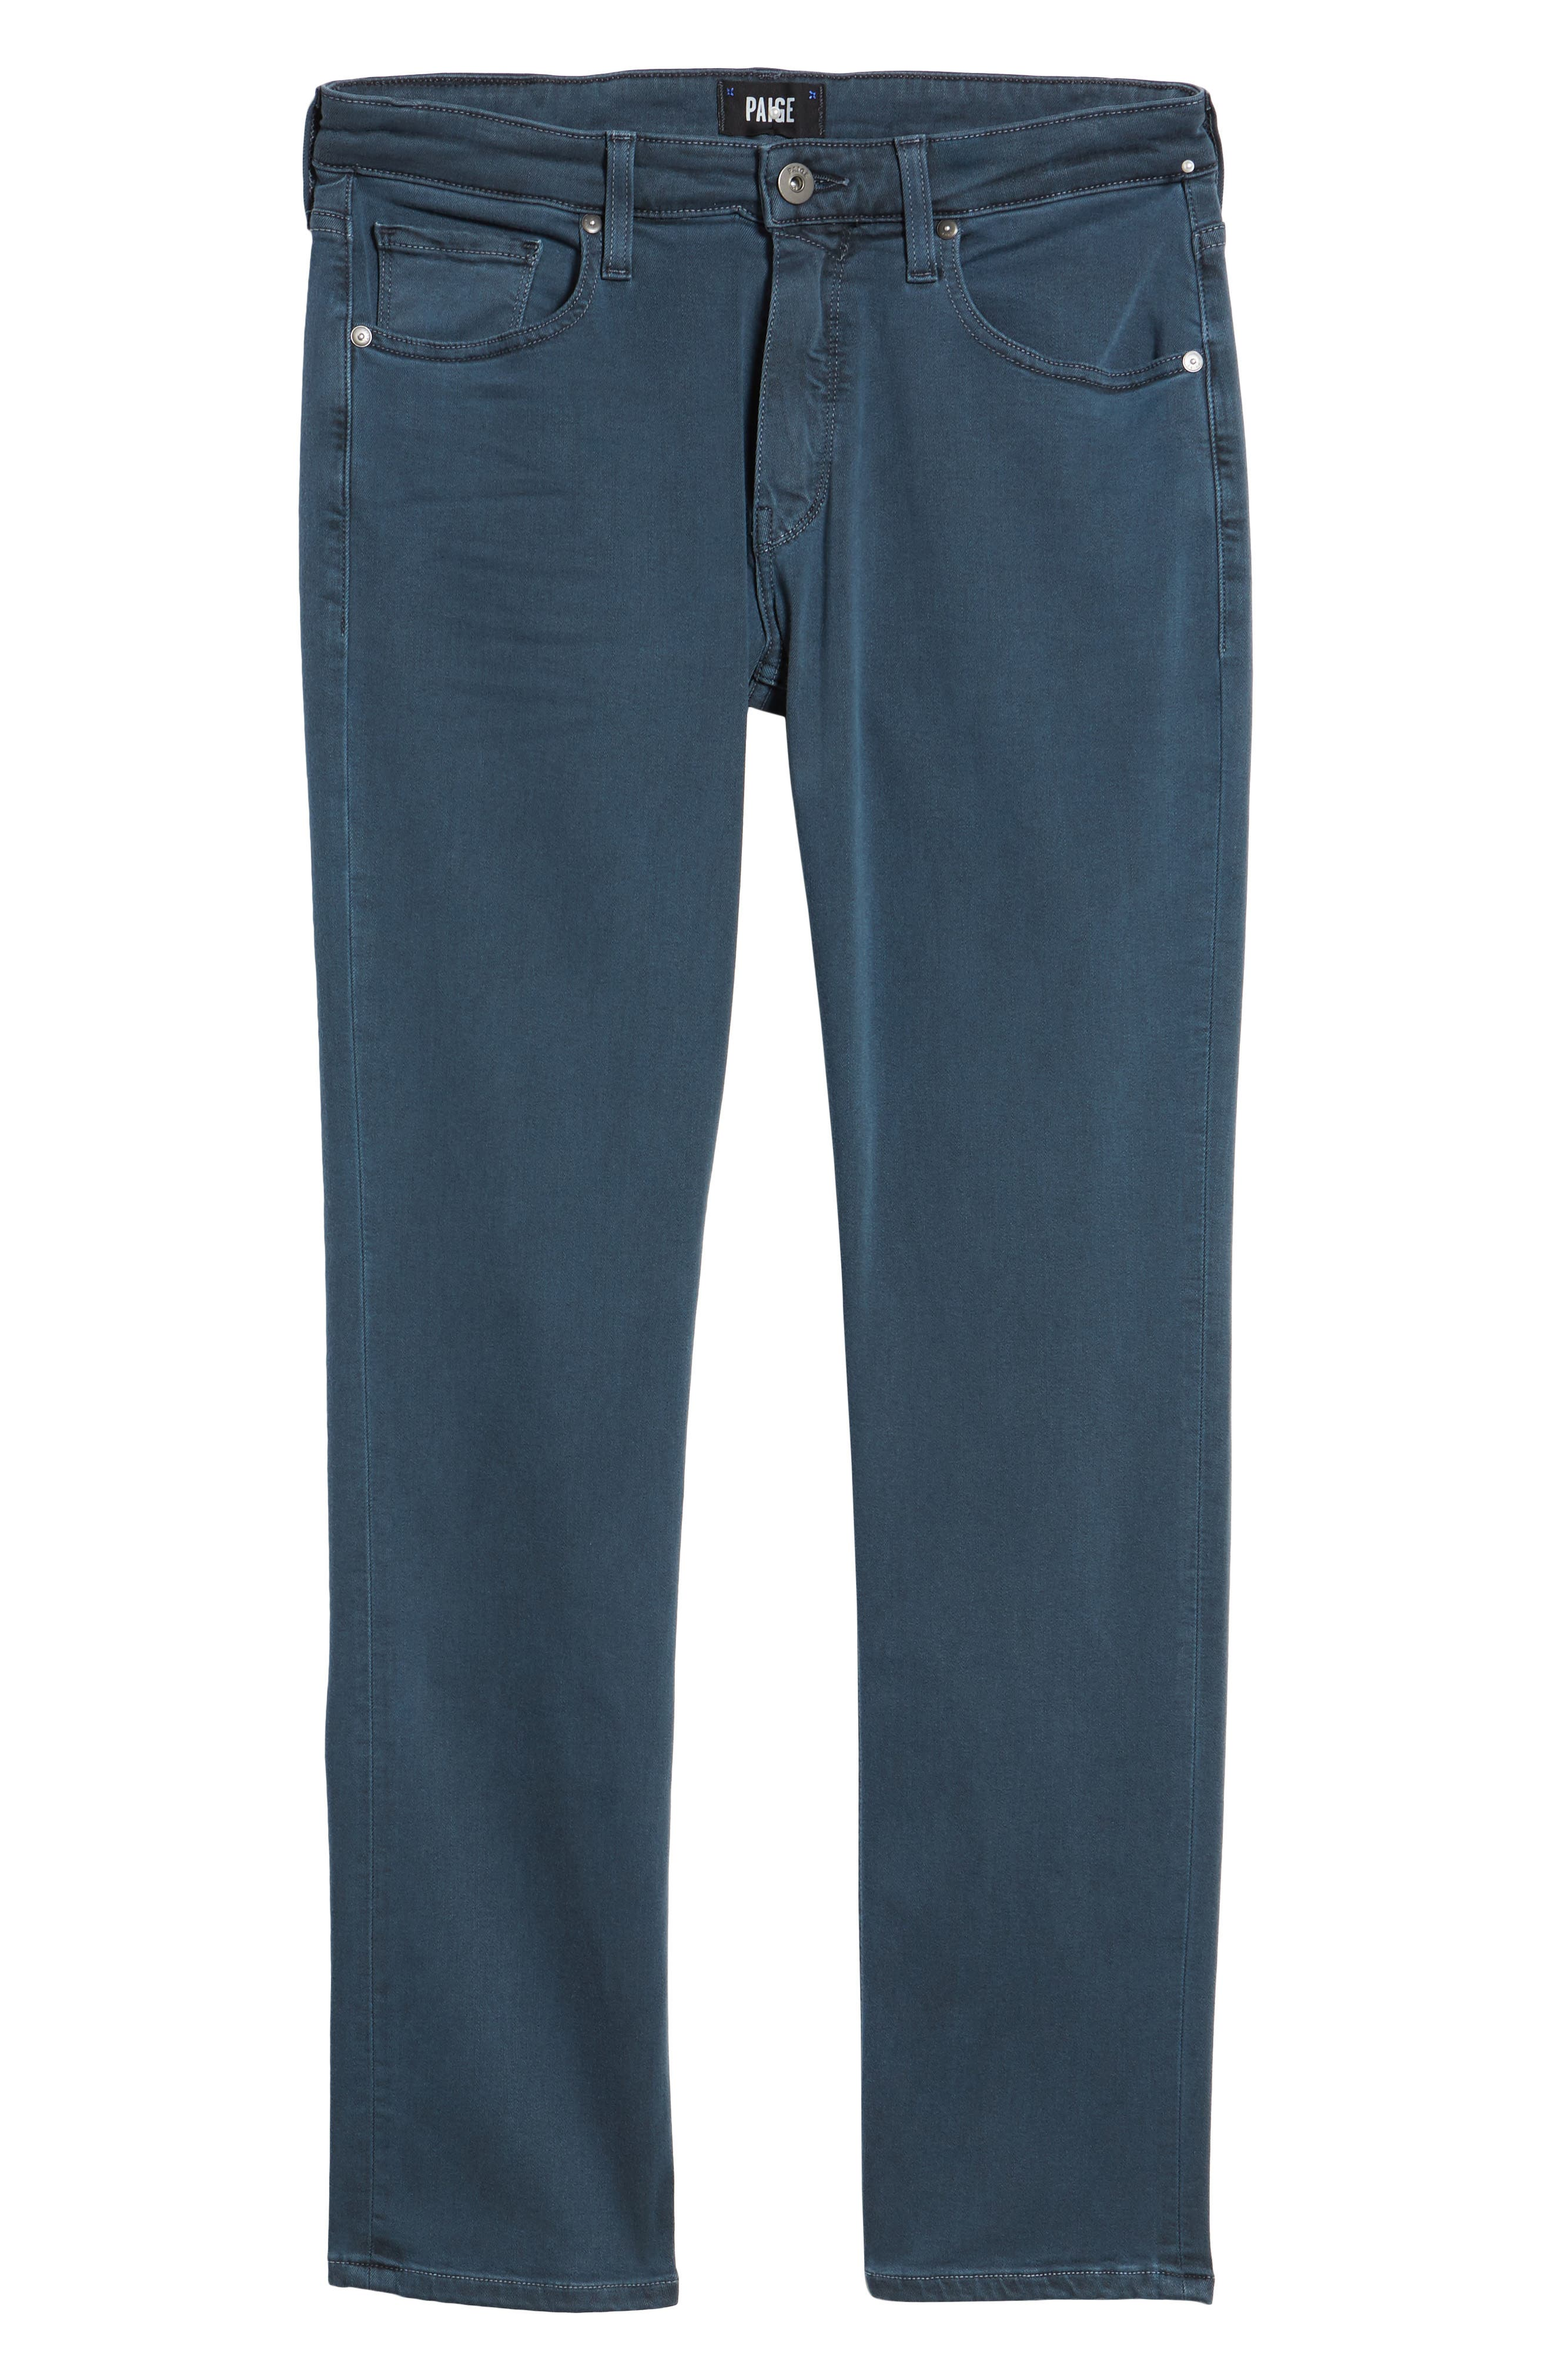 Transcend - Federal Slim Straight Fit Jeans,                             Alternate thumbnail 6, color,                             VINTAGE AMALFI